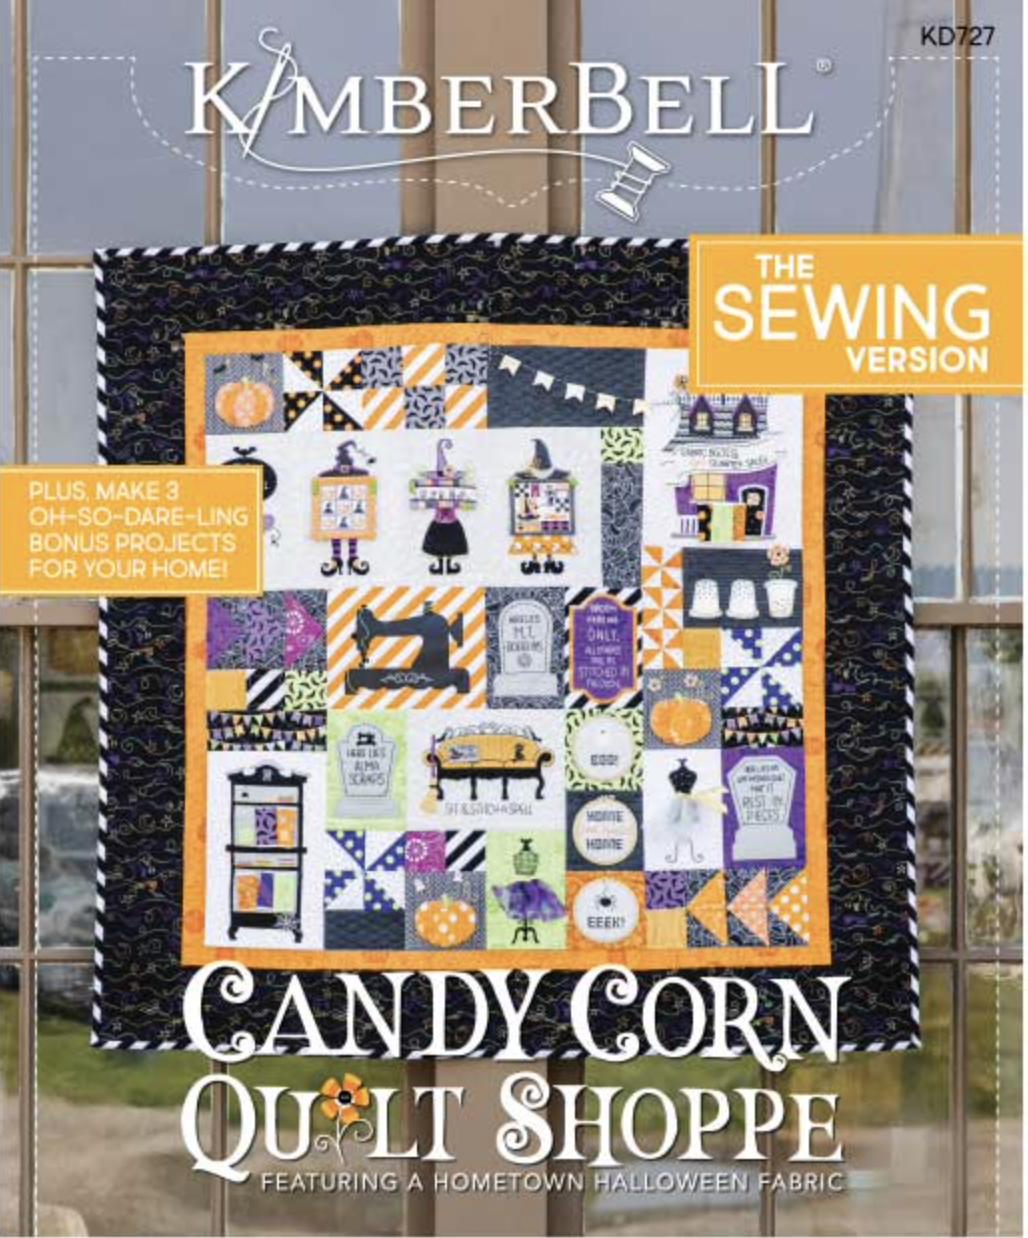 Candy Corn Quilt Shoppe